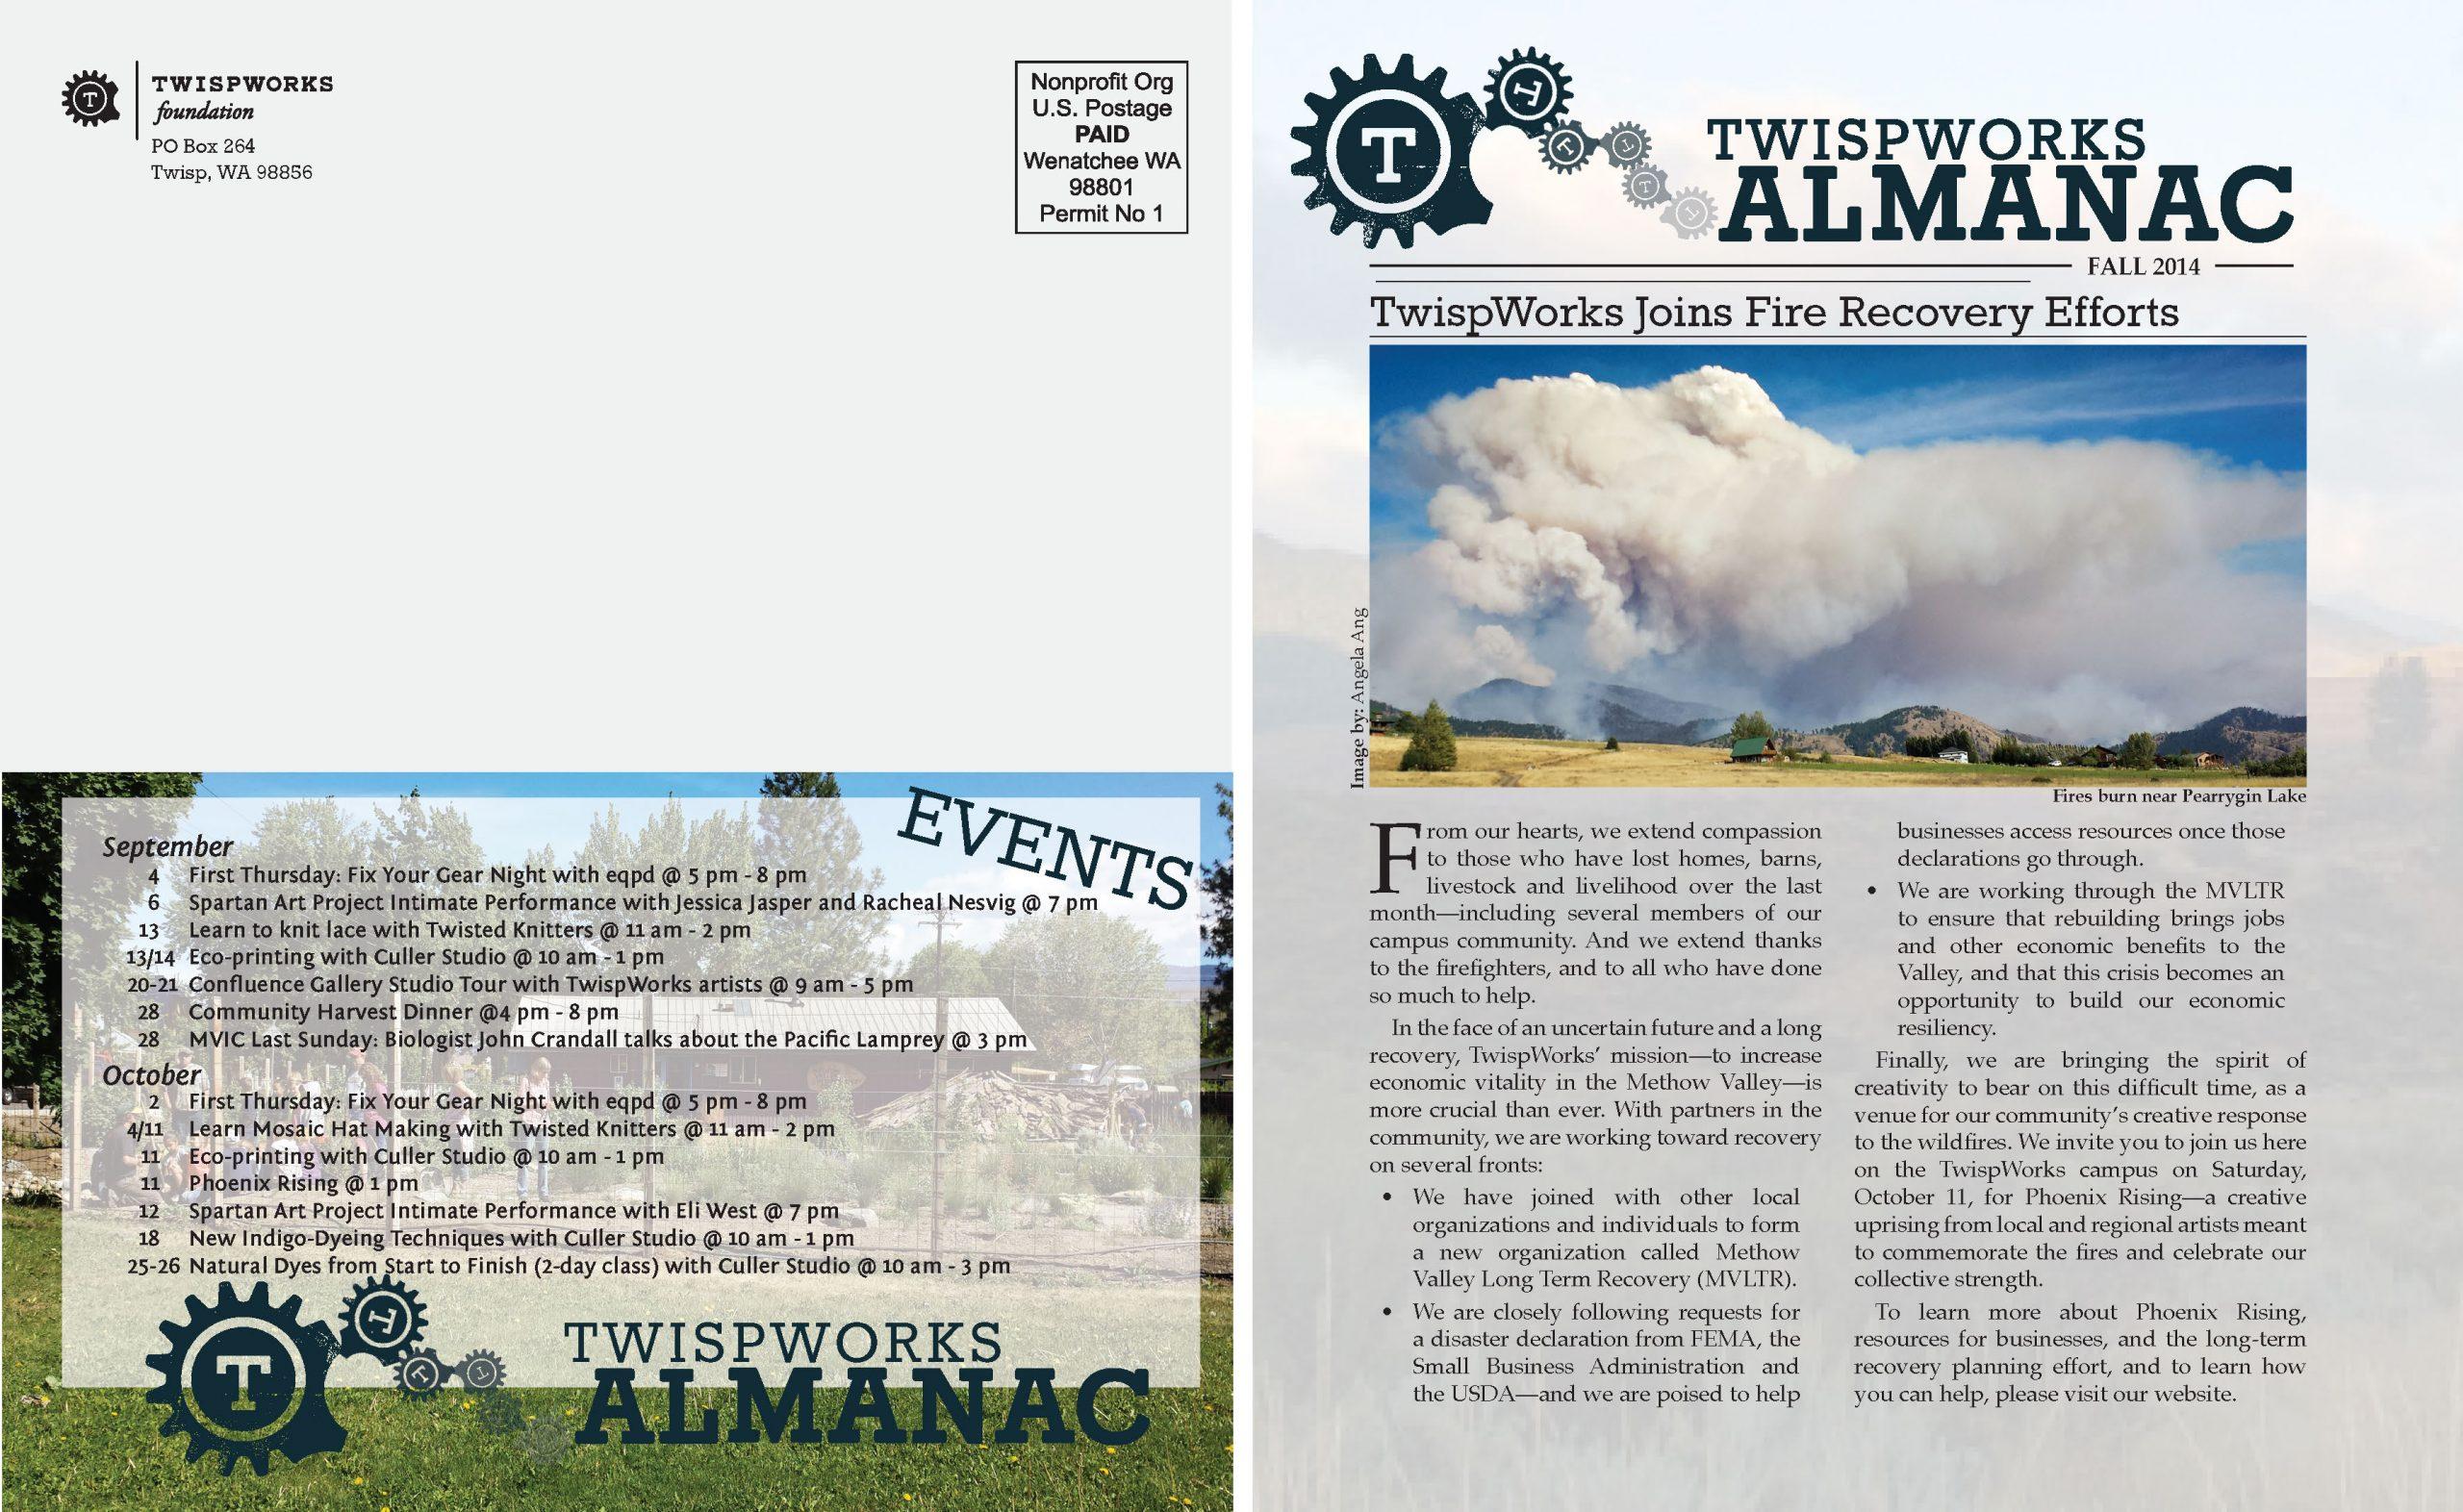 TwispWorks Almanac